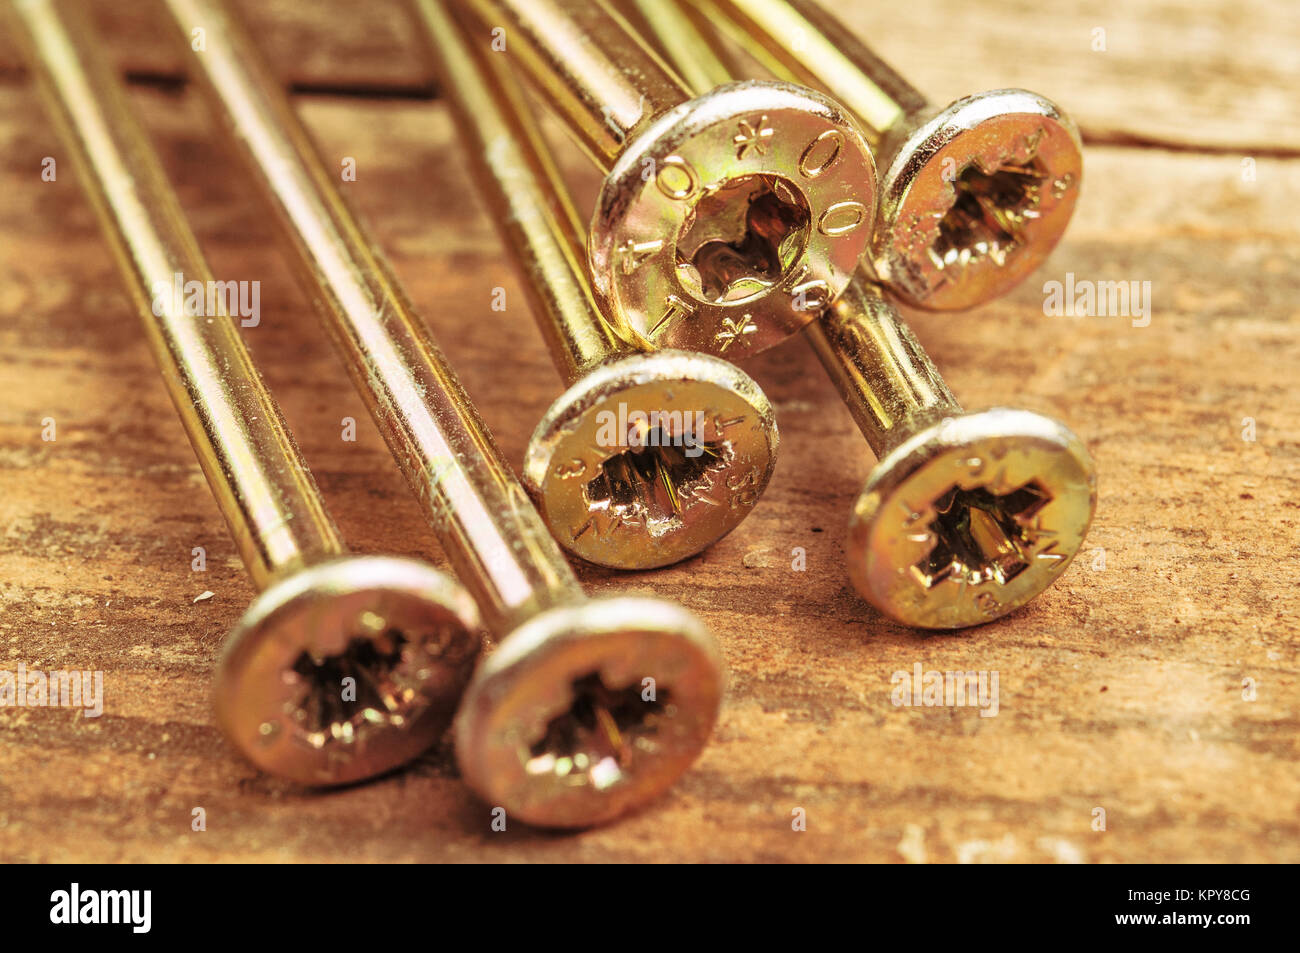 Closeup photo of screw top hats - Stock Image